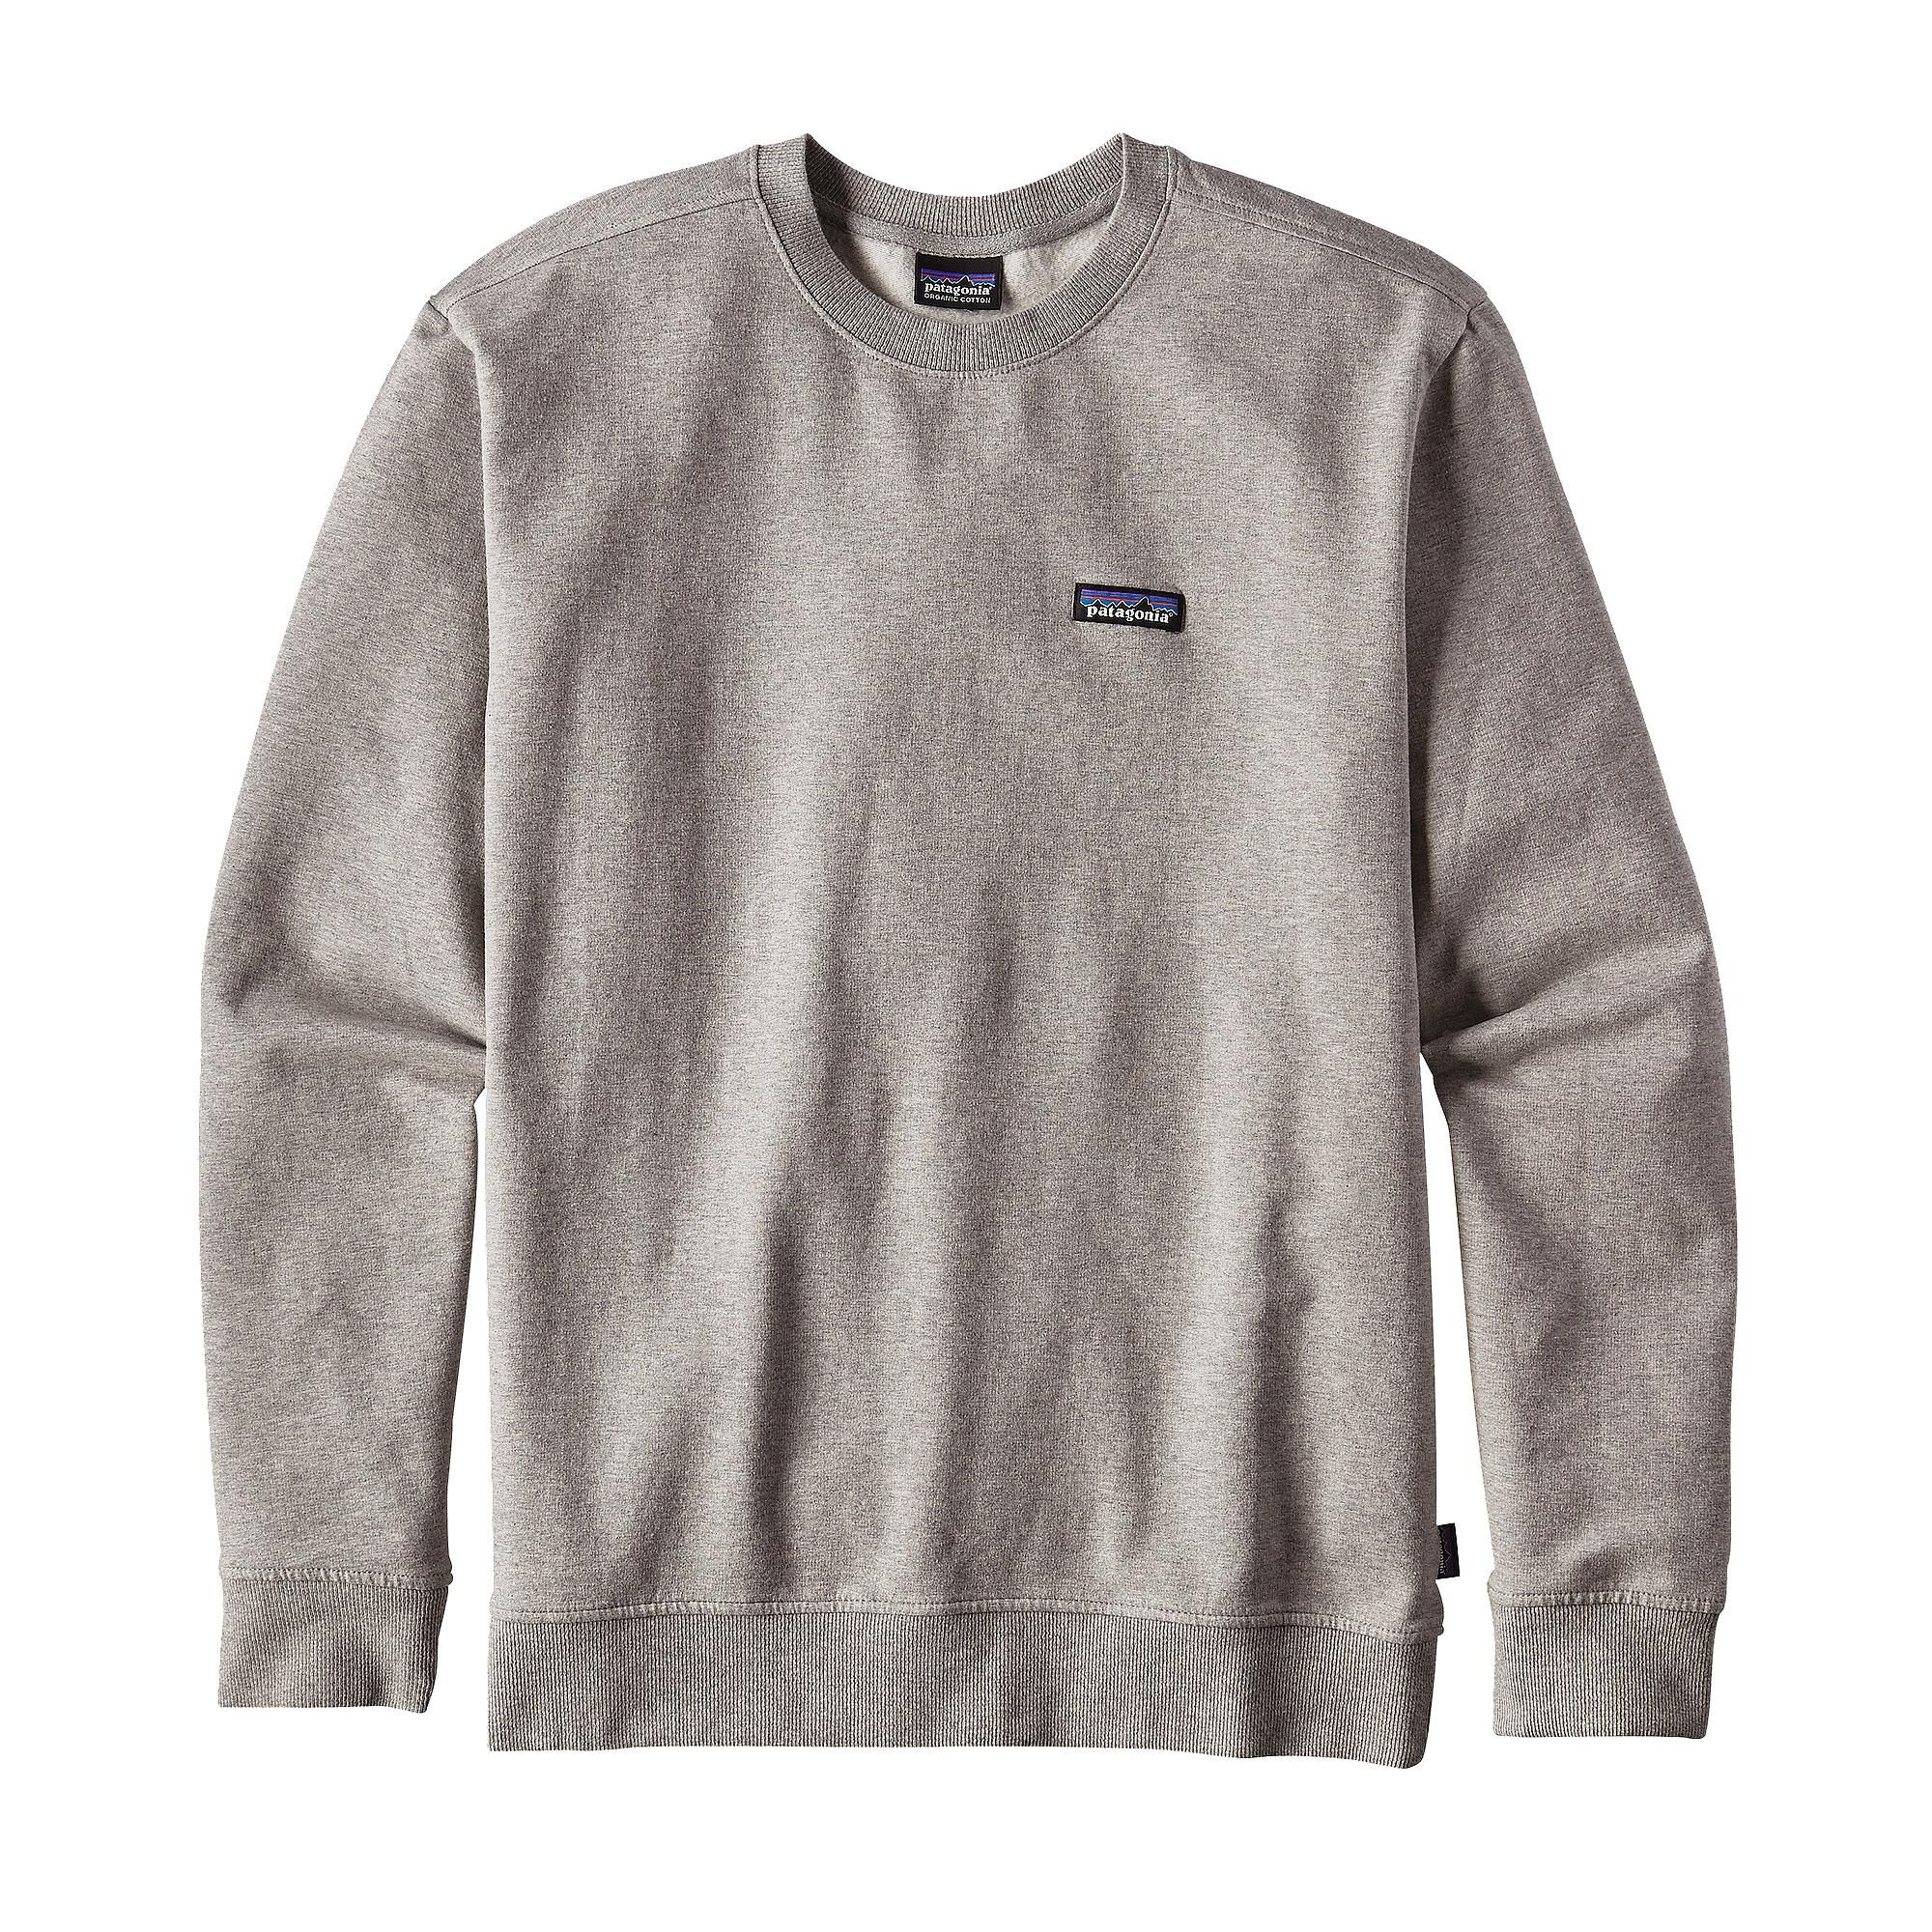 The Patagonia Men S P 6 Label Midweight Crew Sweatshirt Is A Comfortable Pullover Style Organic Cotton Pol Sweatshirts Long Sleeve Tshirt Men Mens Sweatshirts [ 2000 x 2000 Pixel ]